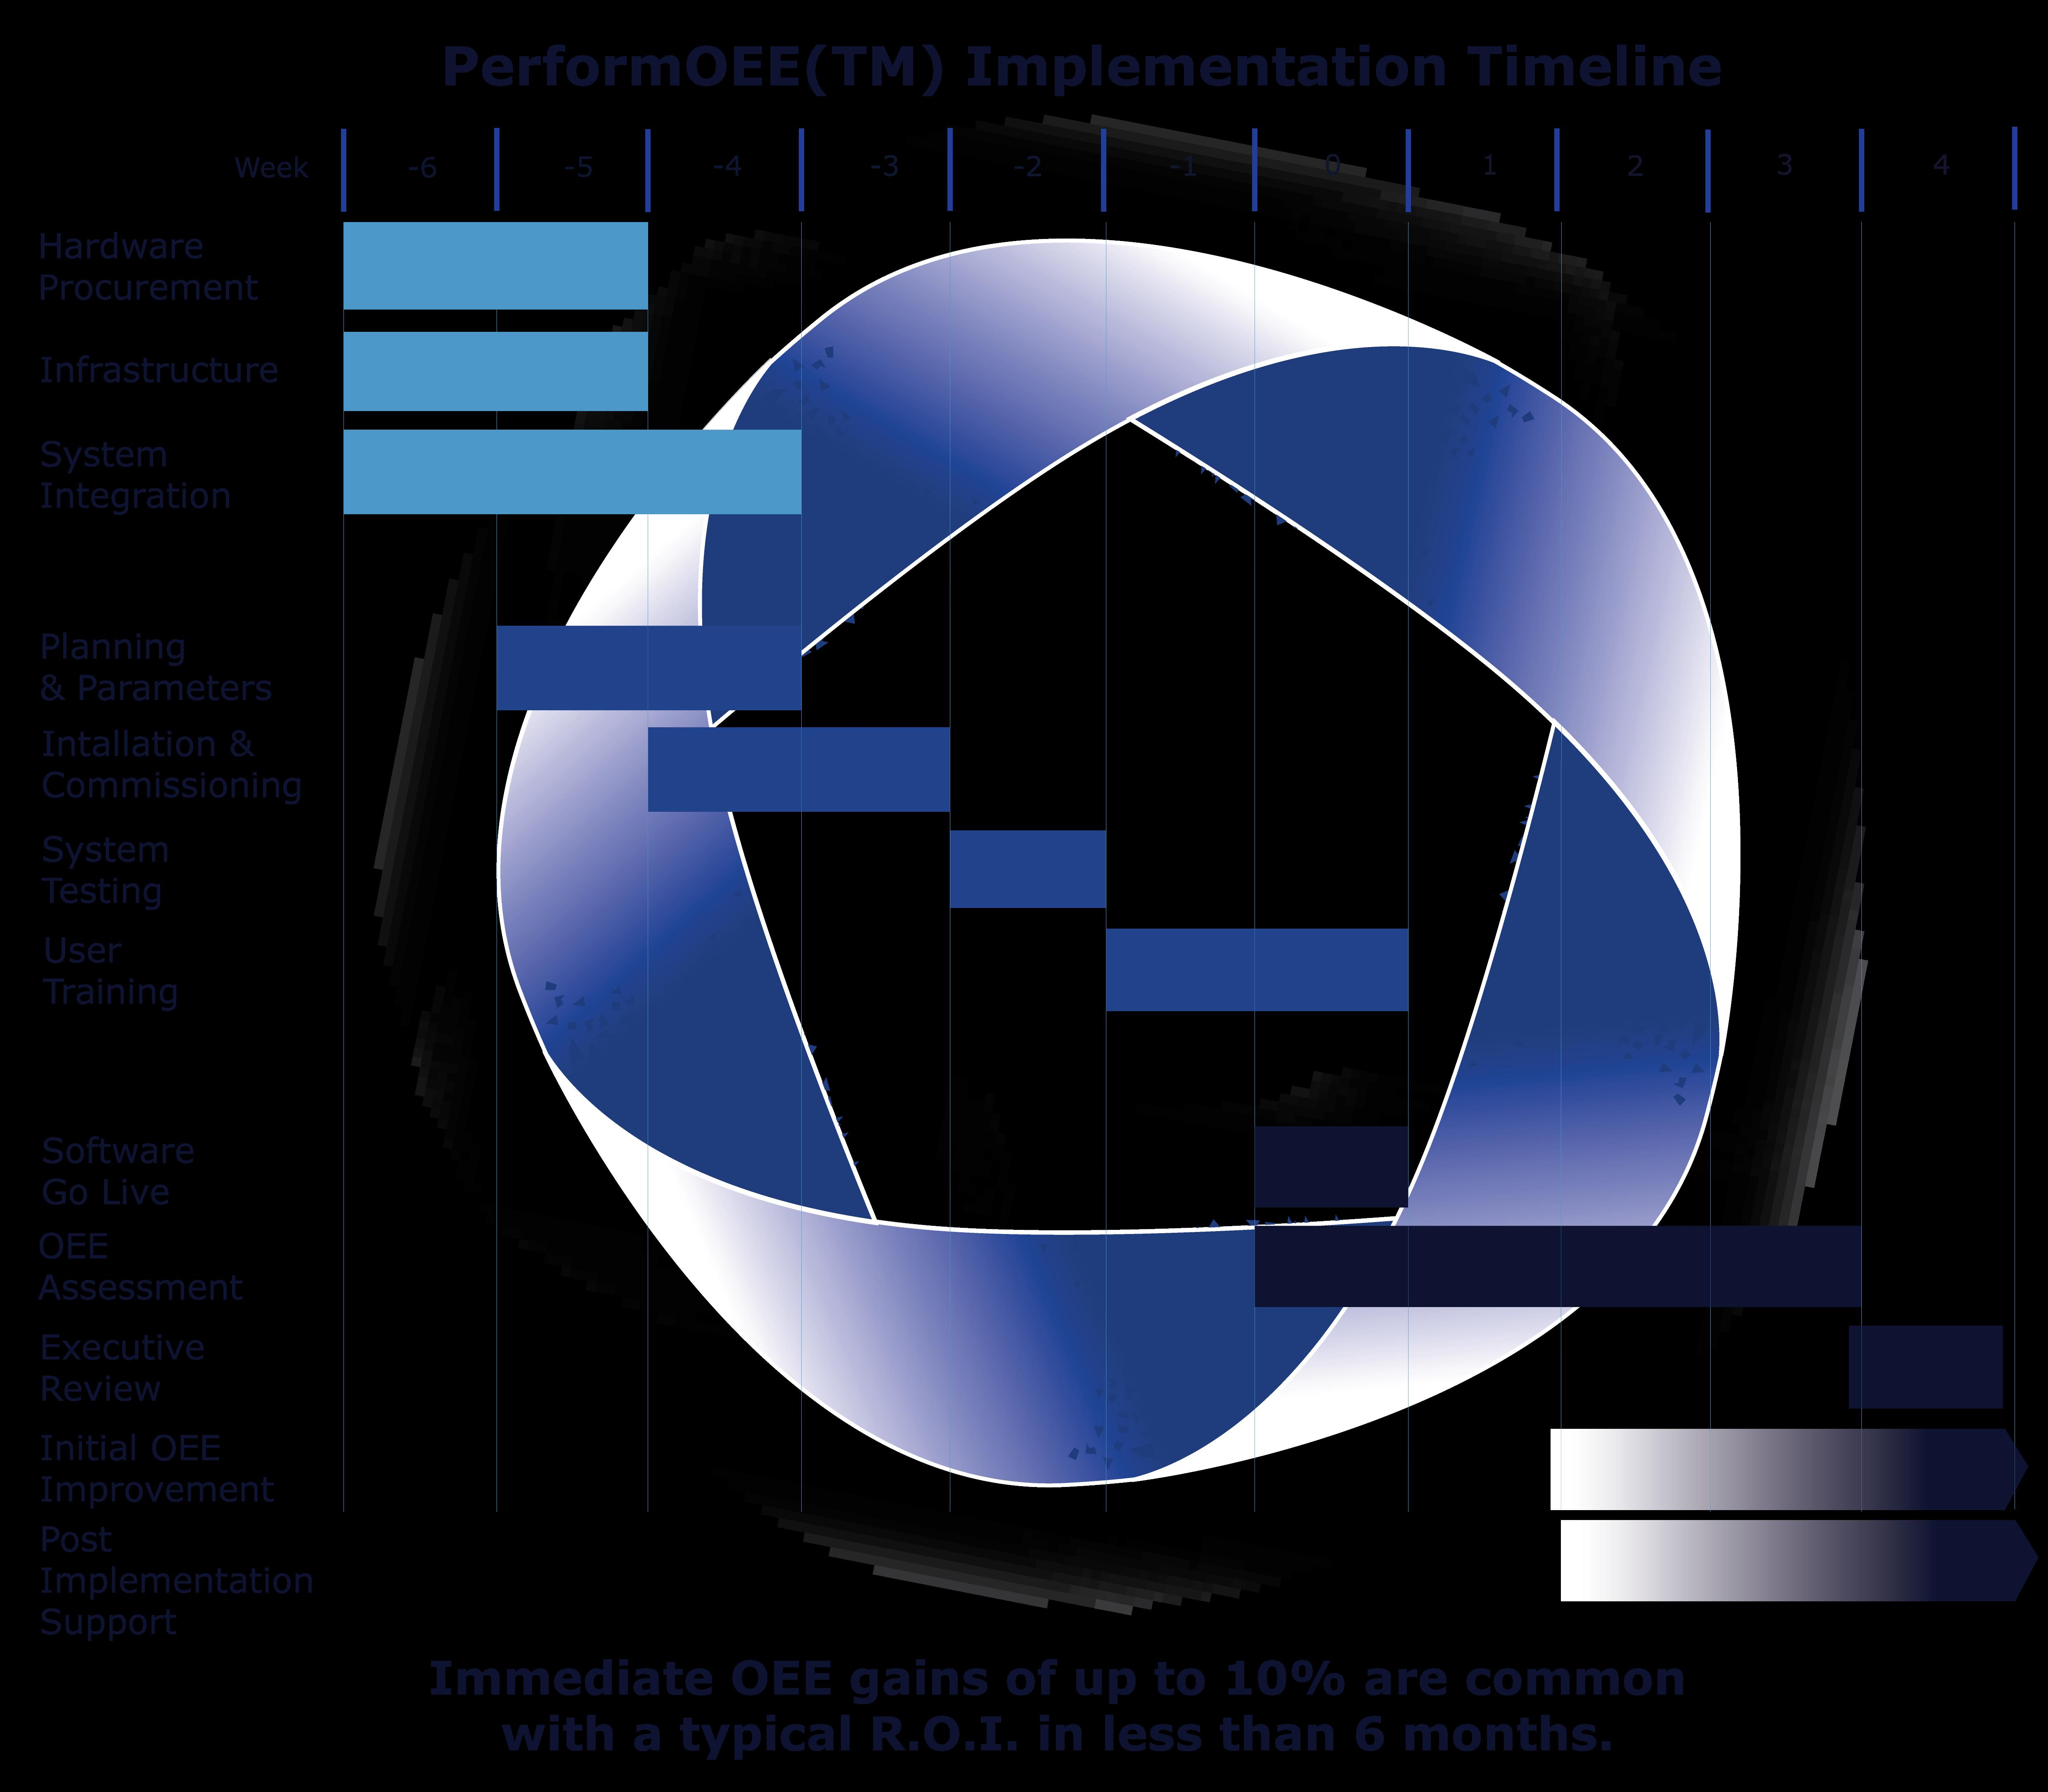 PerfomOEE Smart Factory Software Implementation Timeline Gantt Chart